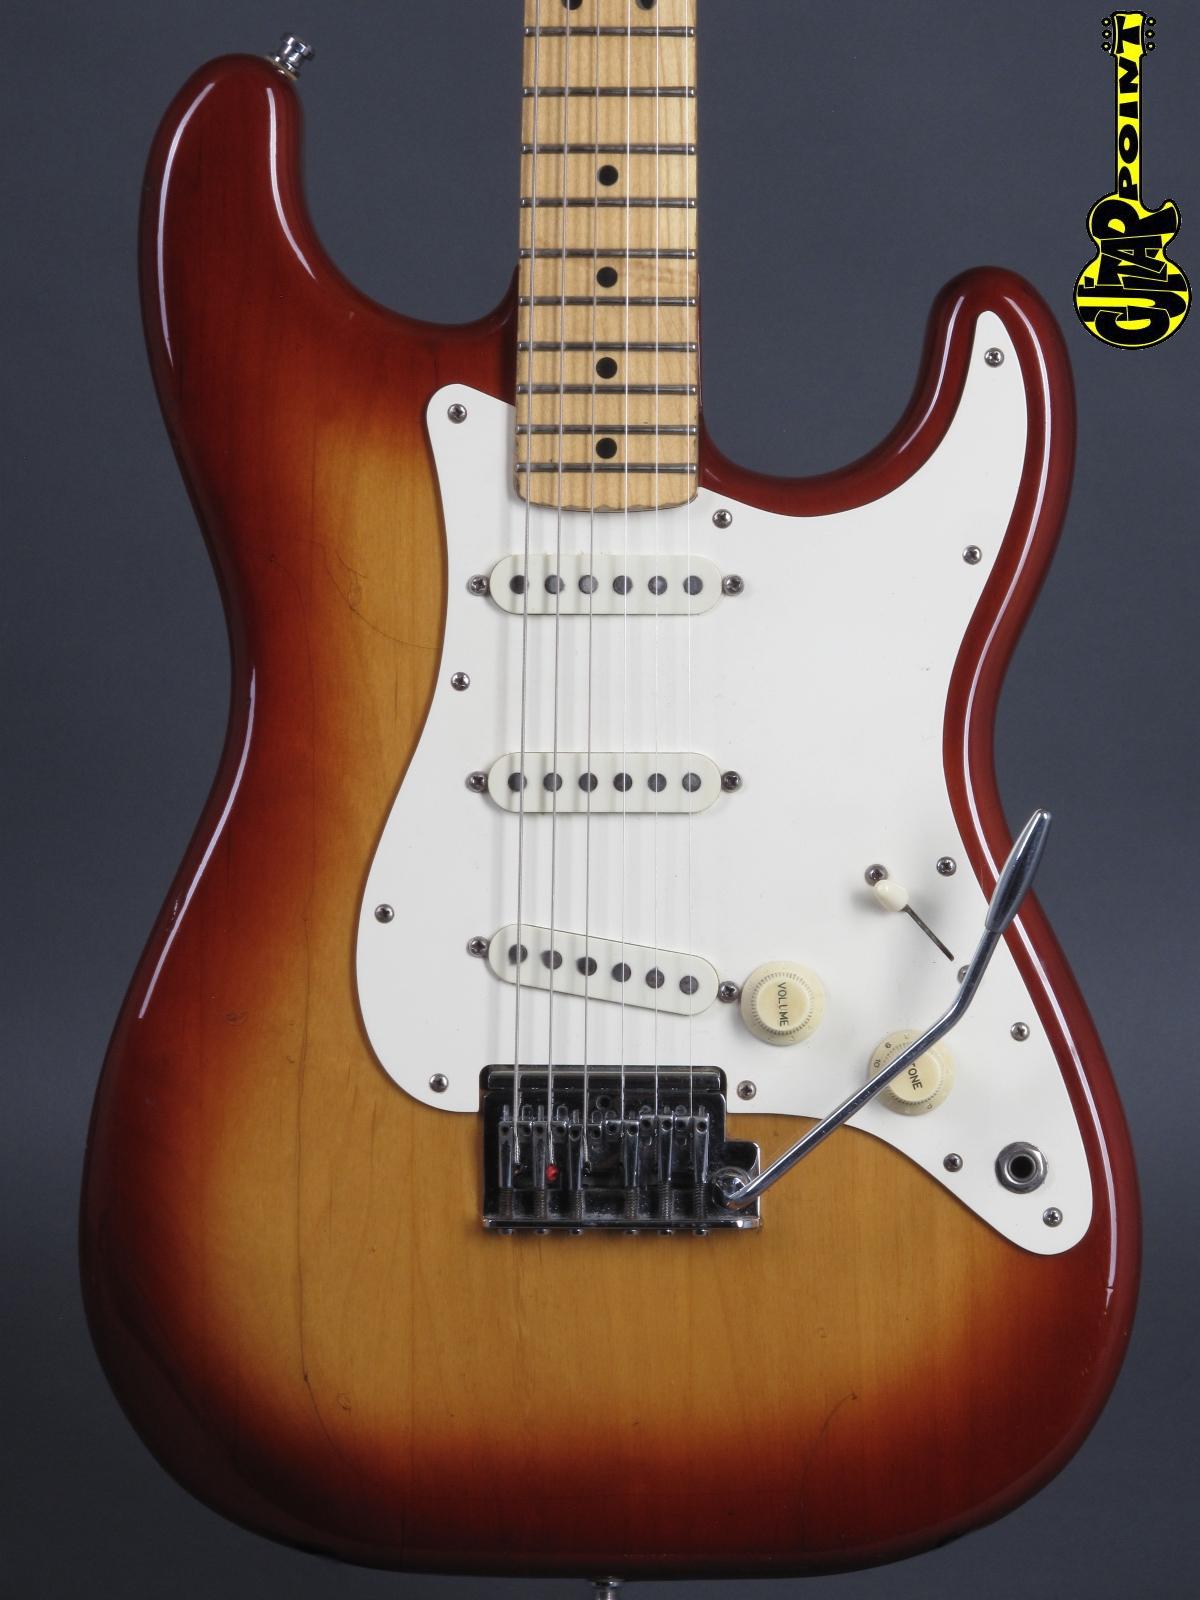 1983 Fender Stratocaster - Sienna Burst